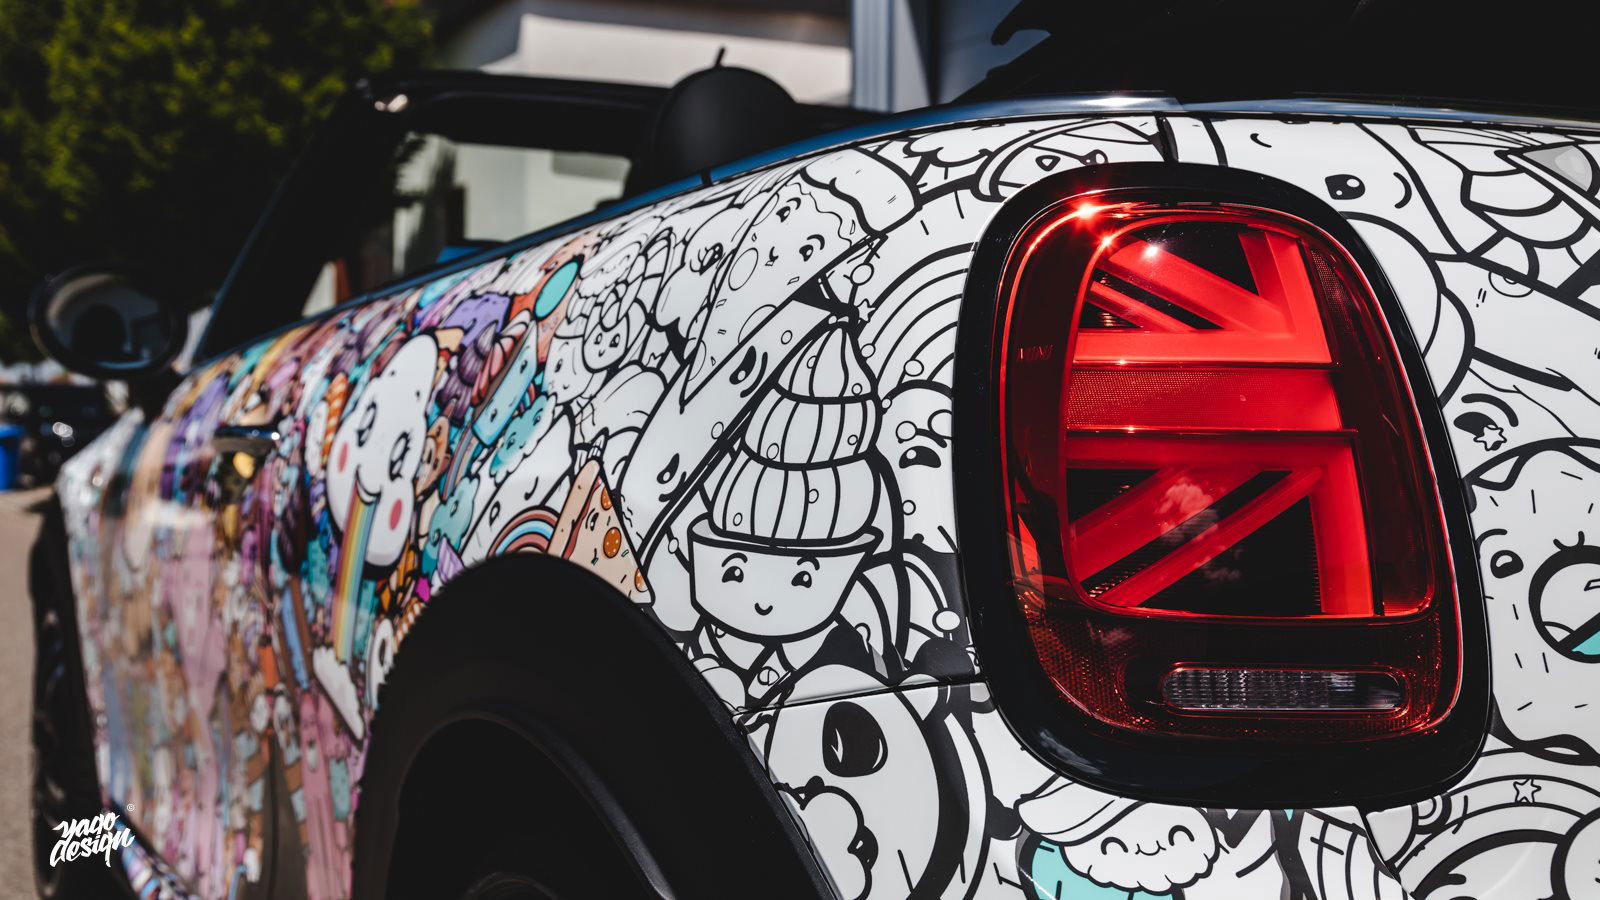 Mini-cooper-JCW-by-Yagodesign-by-Kamil-Lizak-Car-wrapping-Design-Studio-Automotive-Design-Studio-Kawai-5